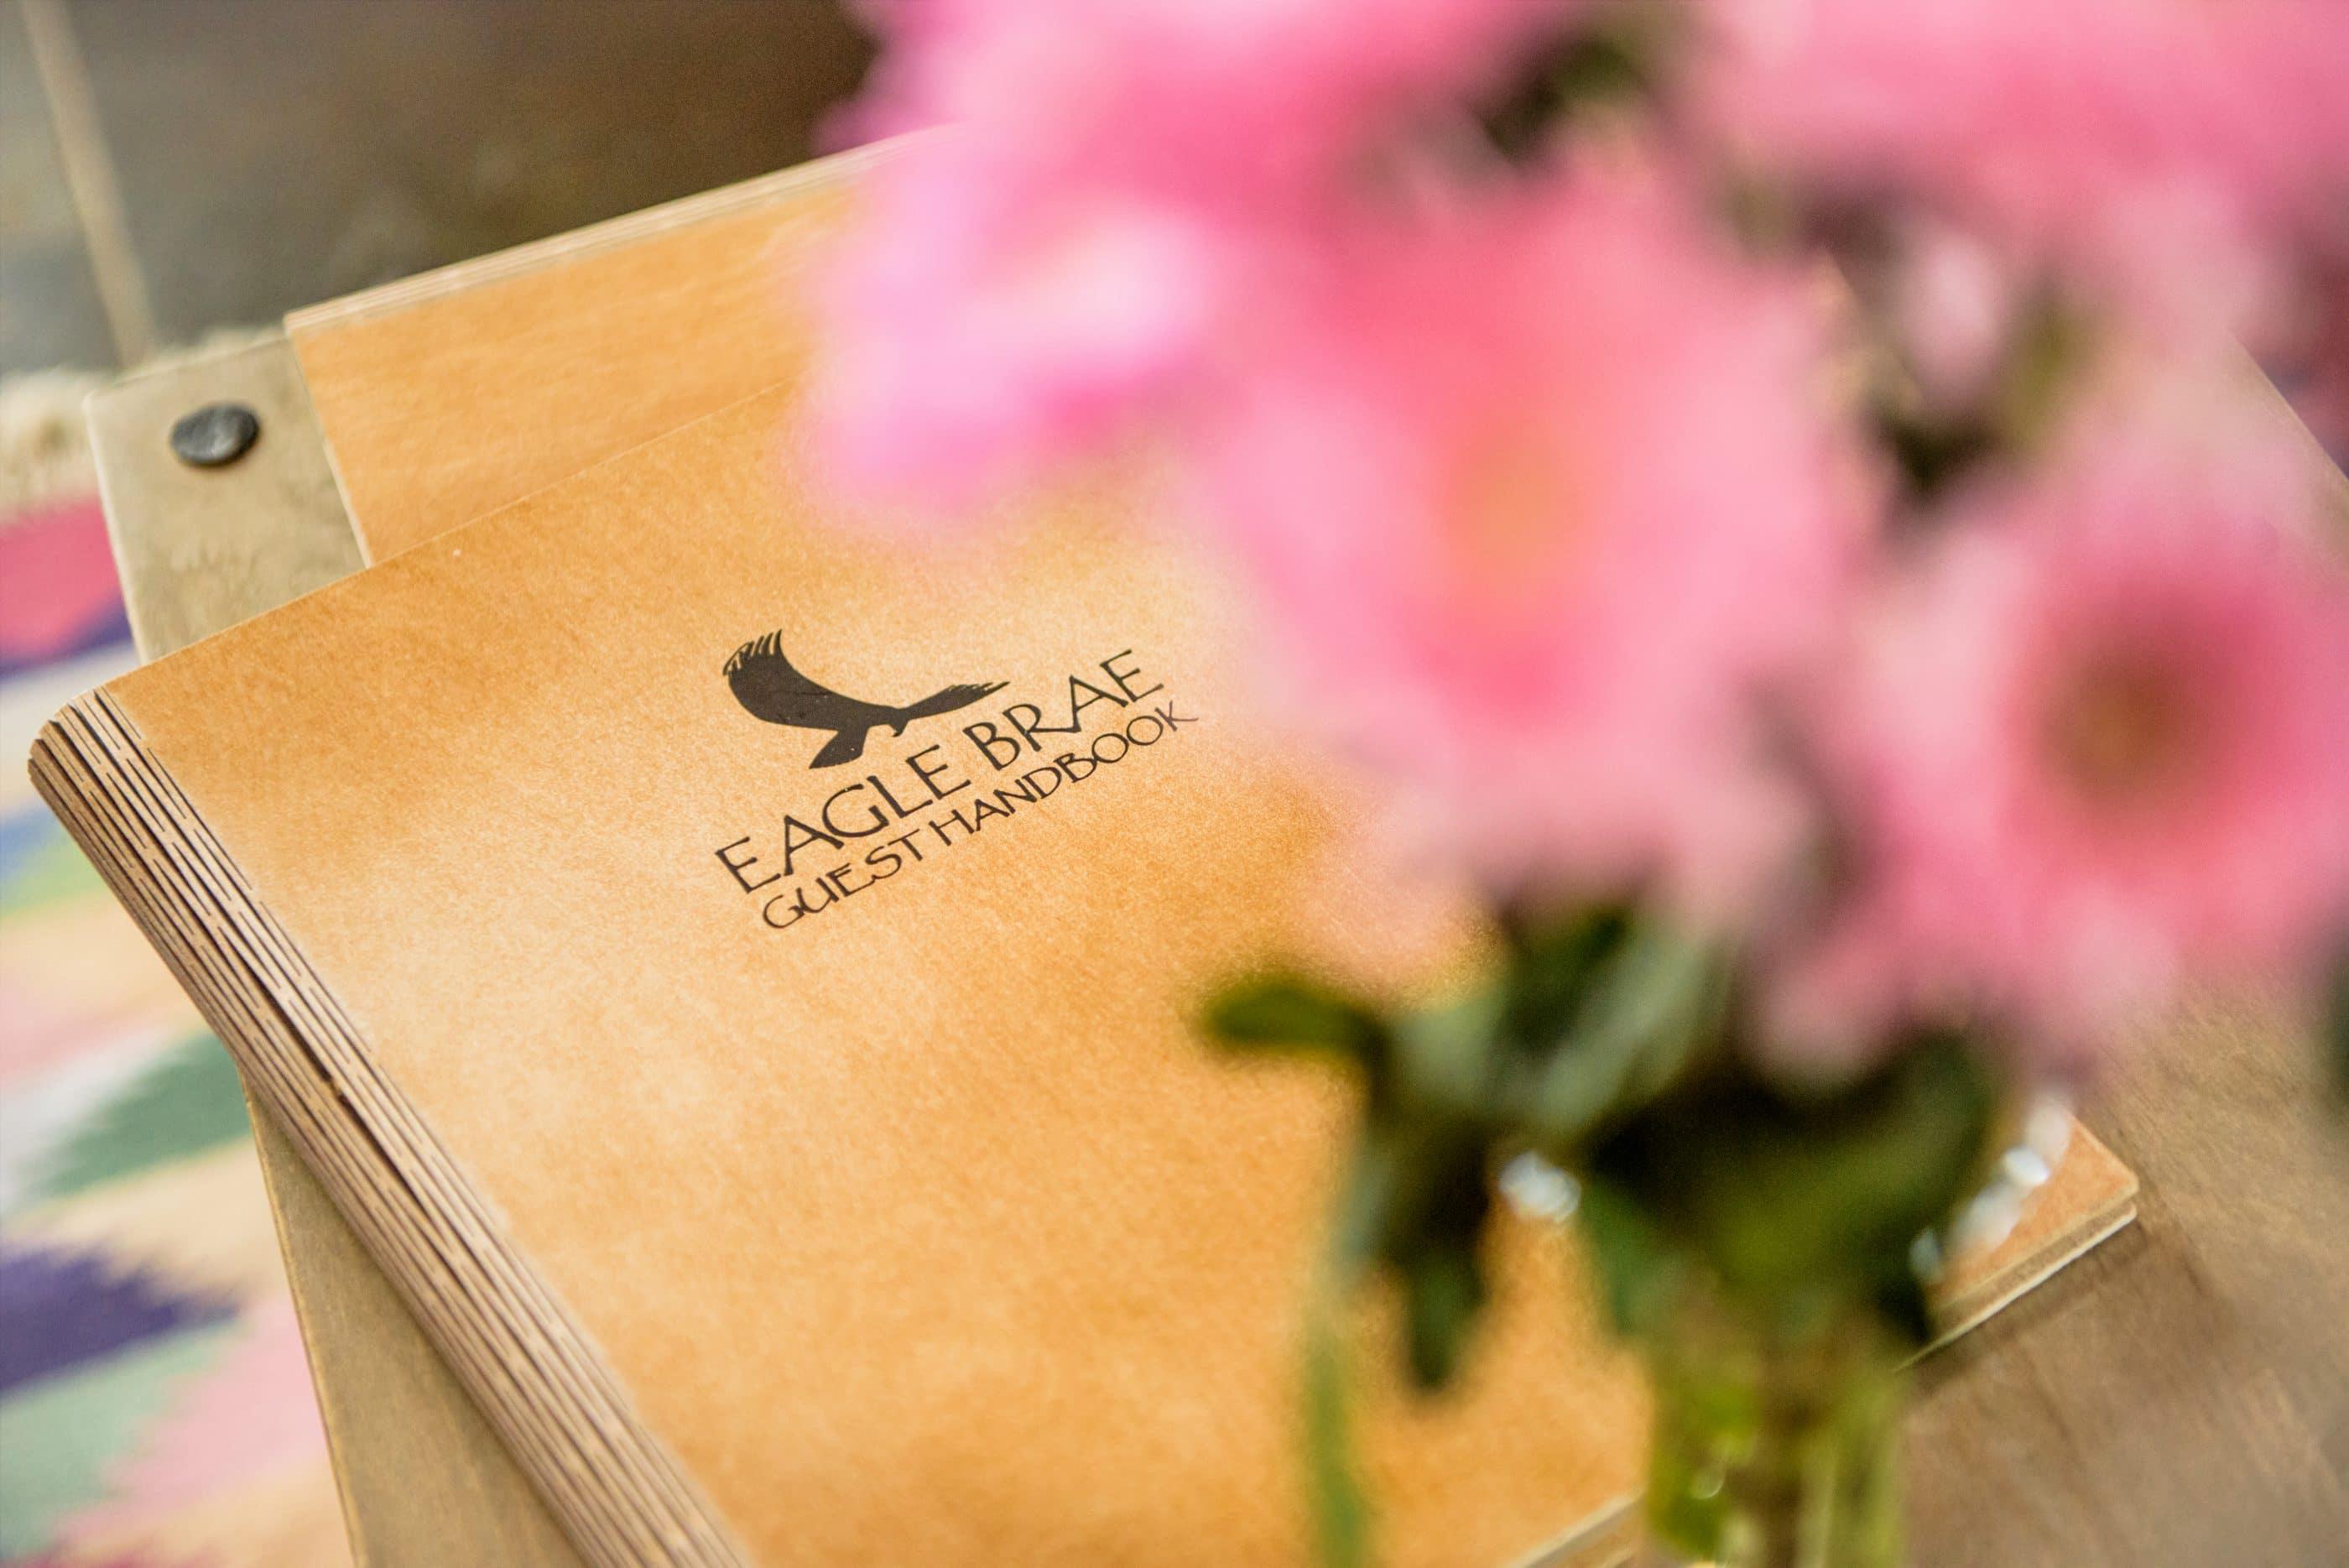 Eagle Brae guest book behind flowers